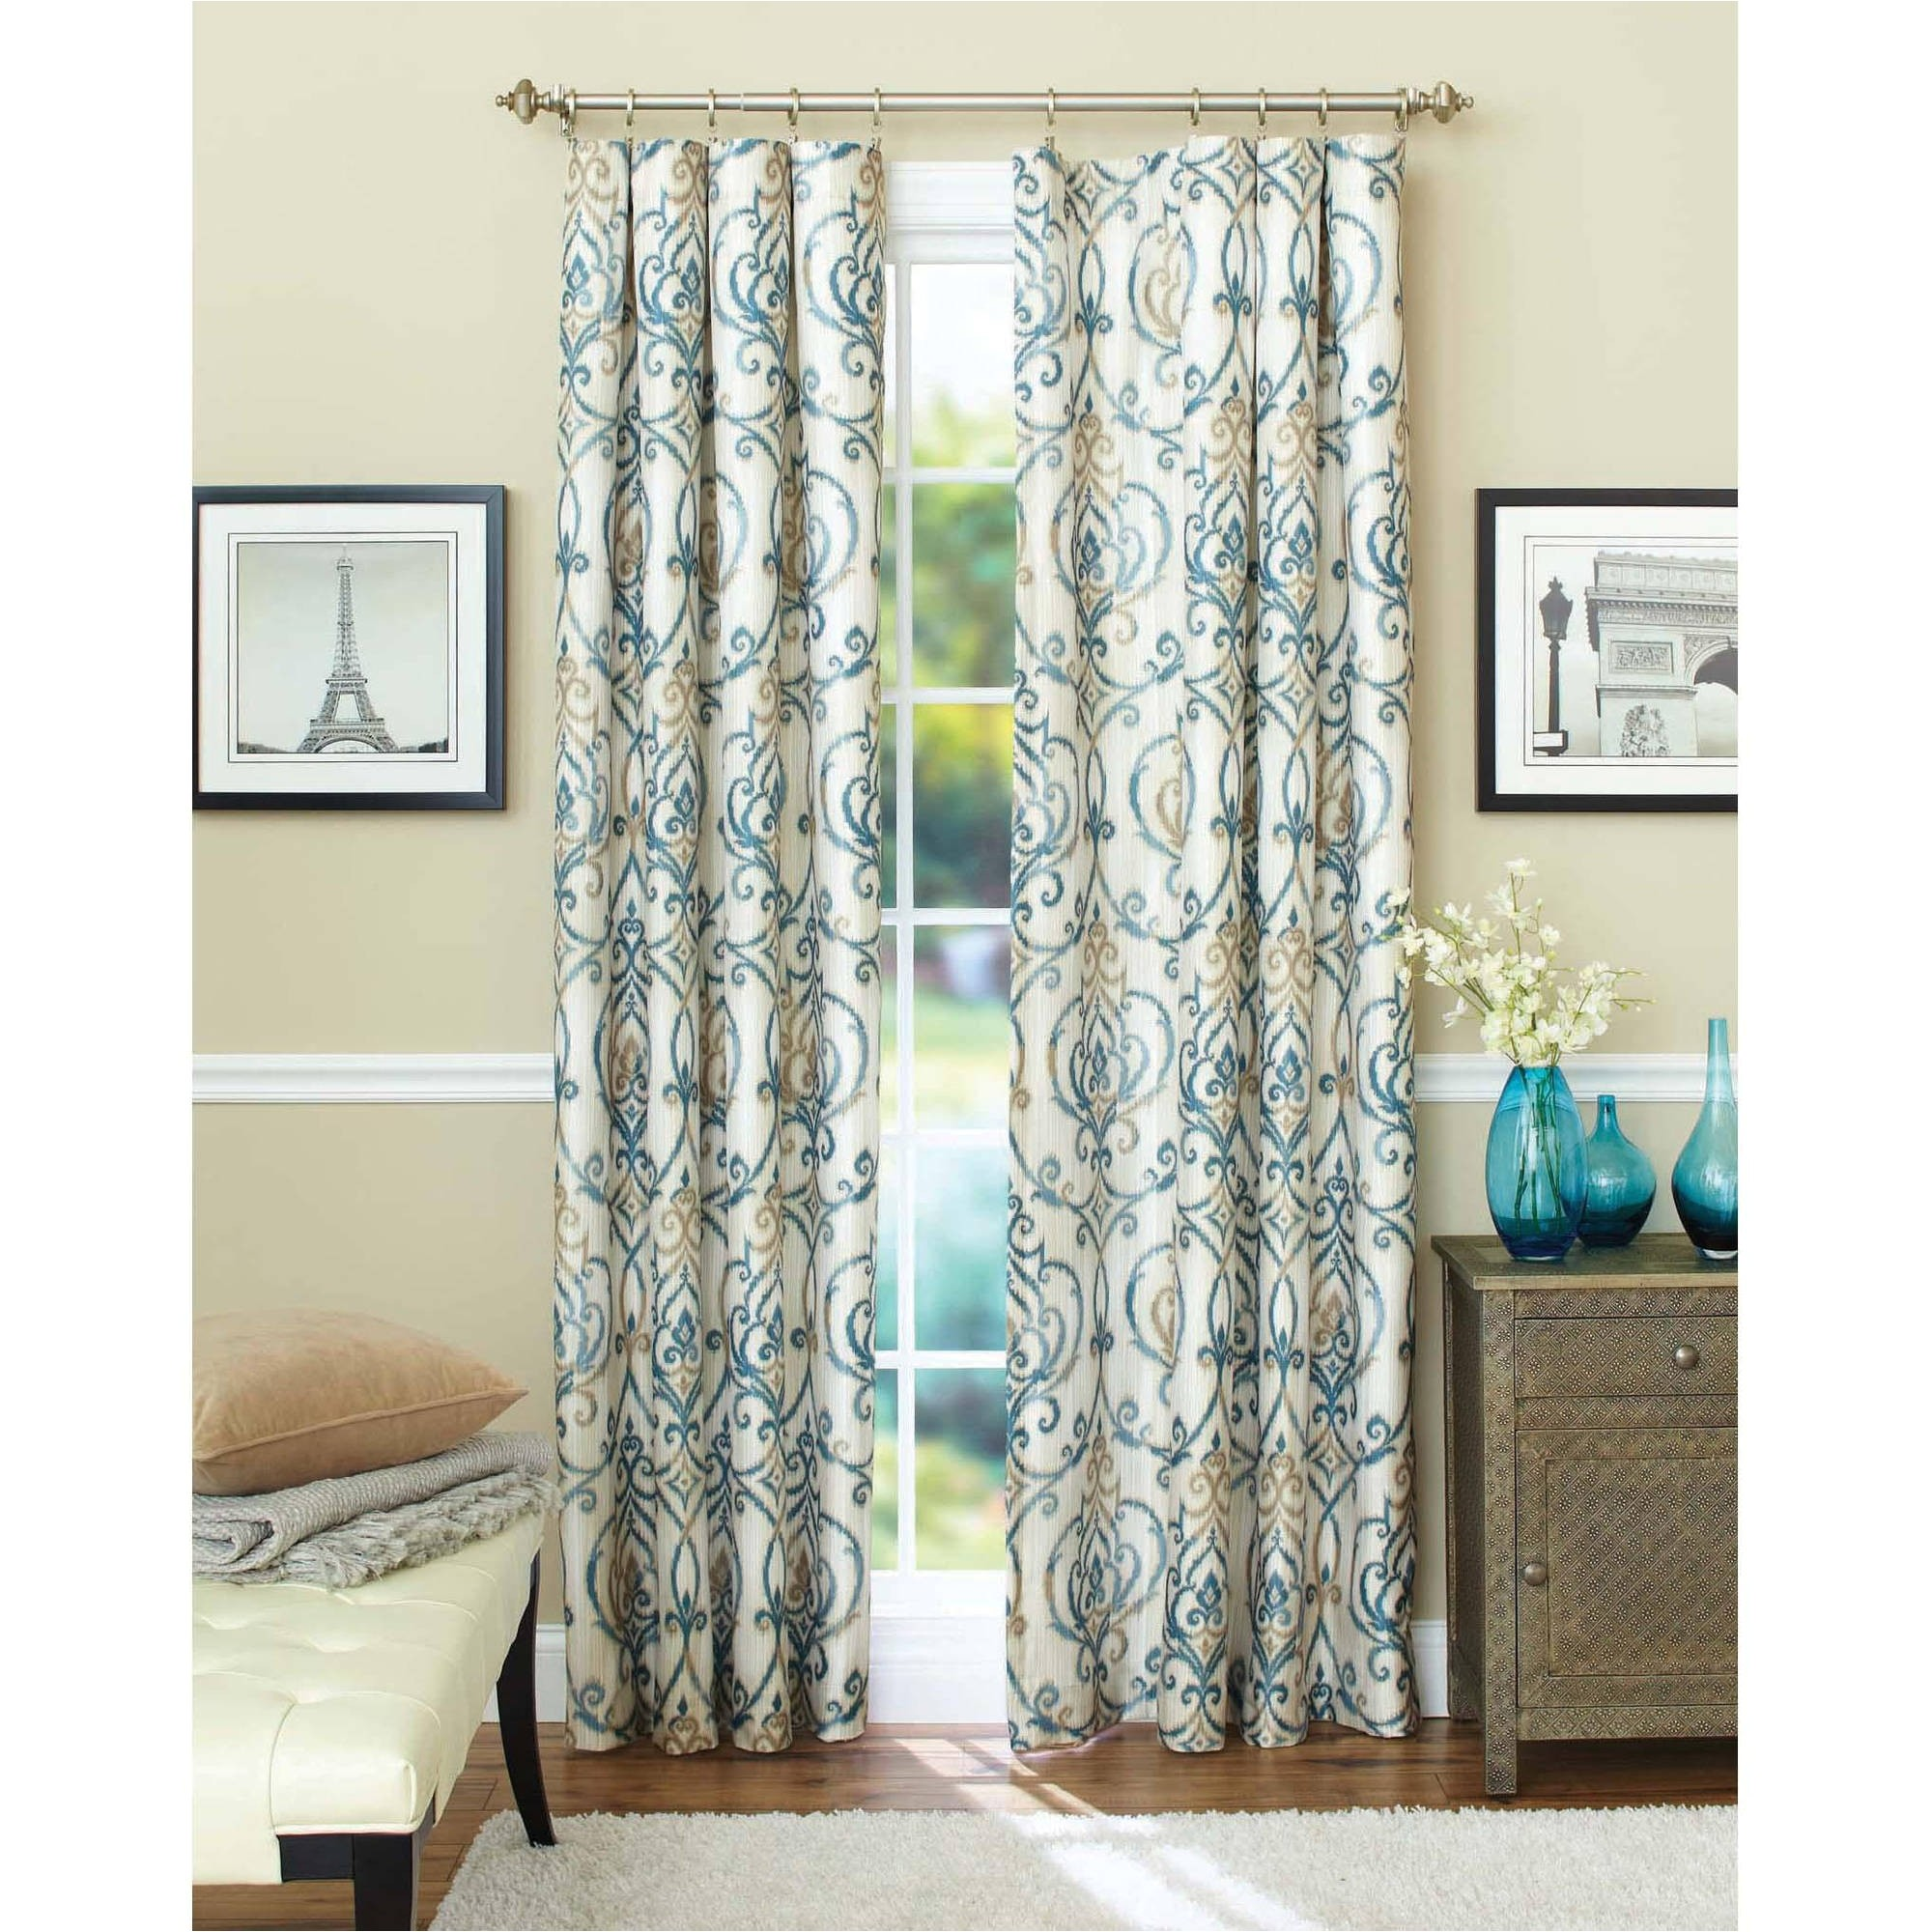 Big Lots Kitchen Window Curtains Big Lots Window Curtains Curtain Menzilperde Net